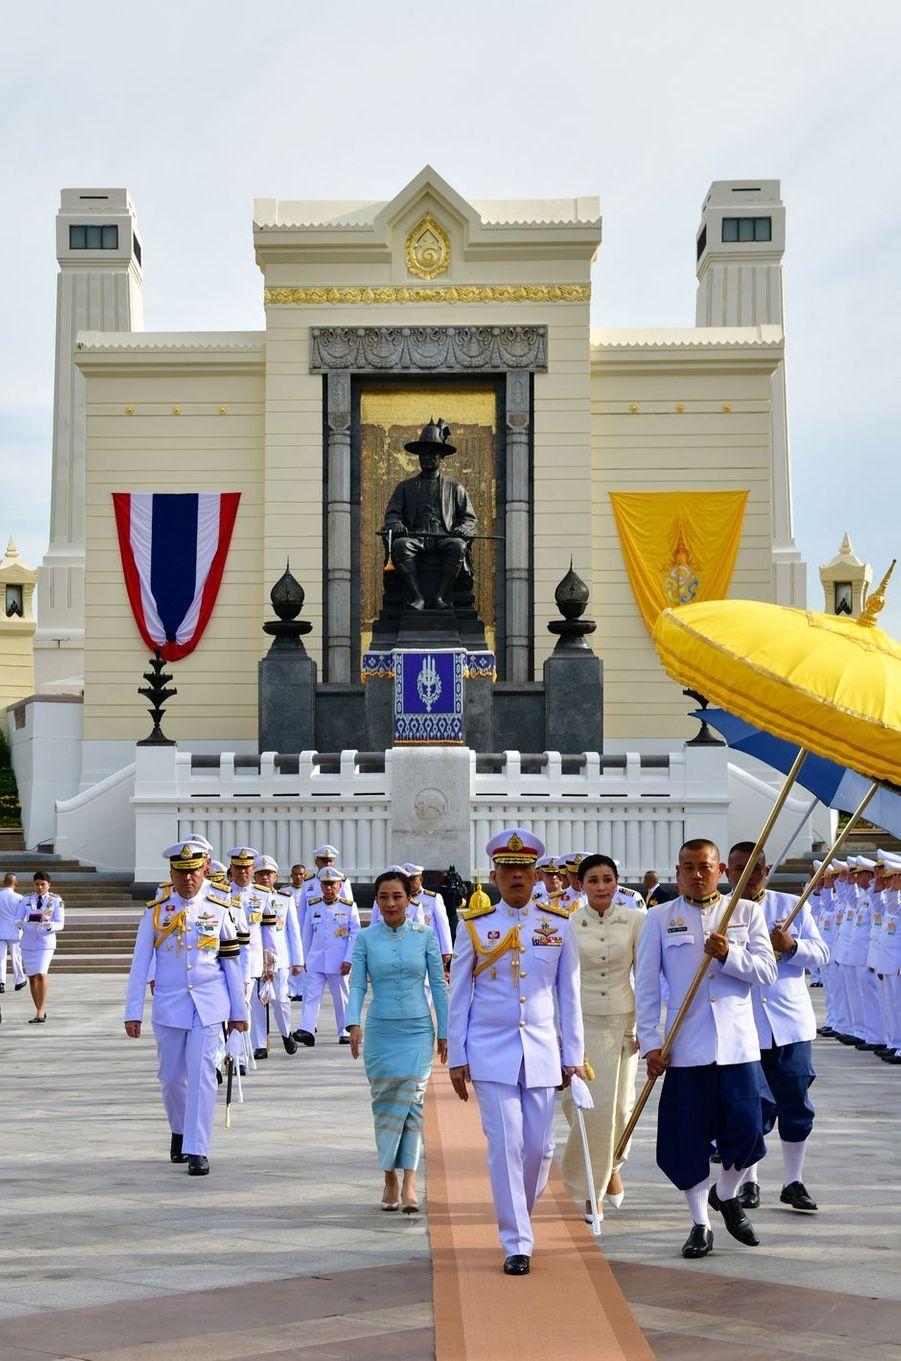 Le roi Maha Vajiralongkorn de Thaïlande (Rama X), la reine Suthida et la princesse Bajrakitiyabha à Bangkok, le 2 mai 2019